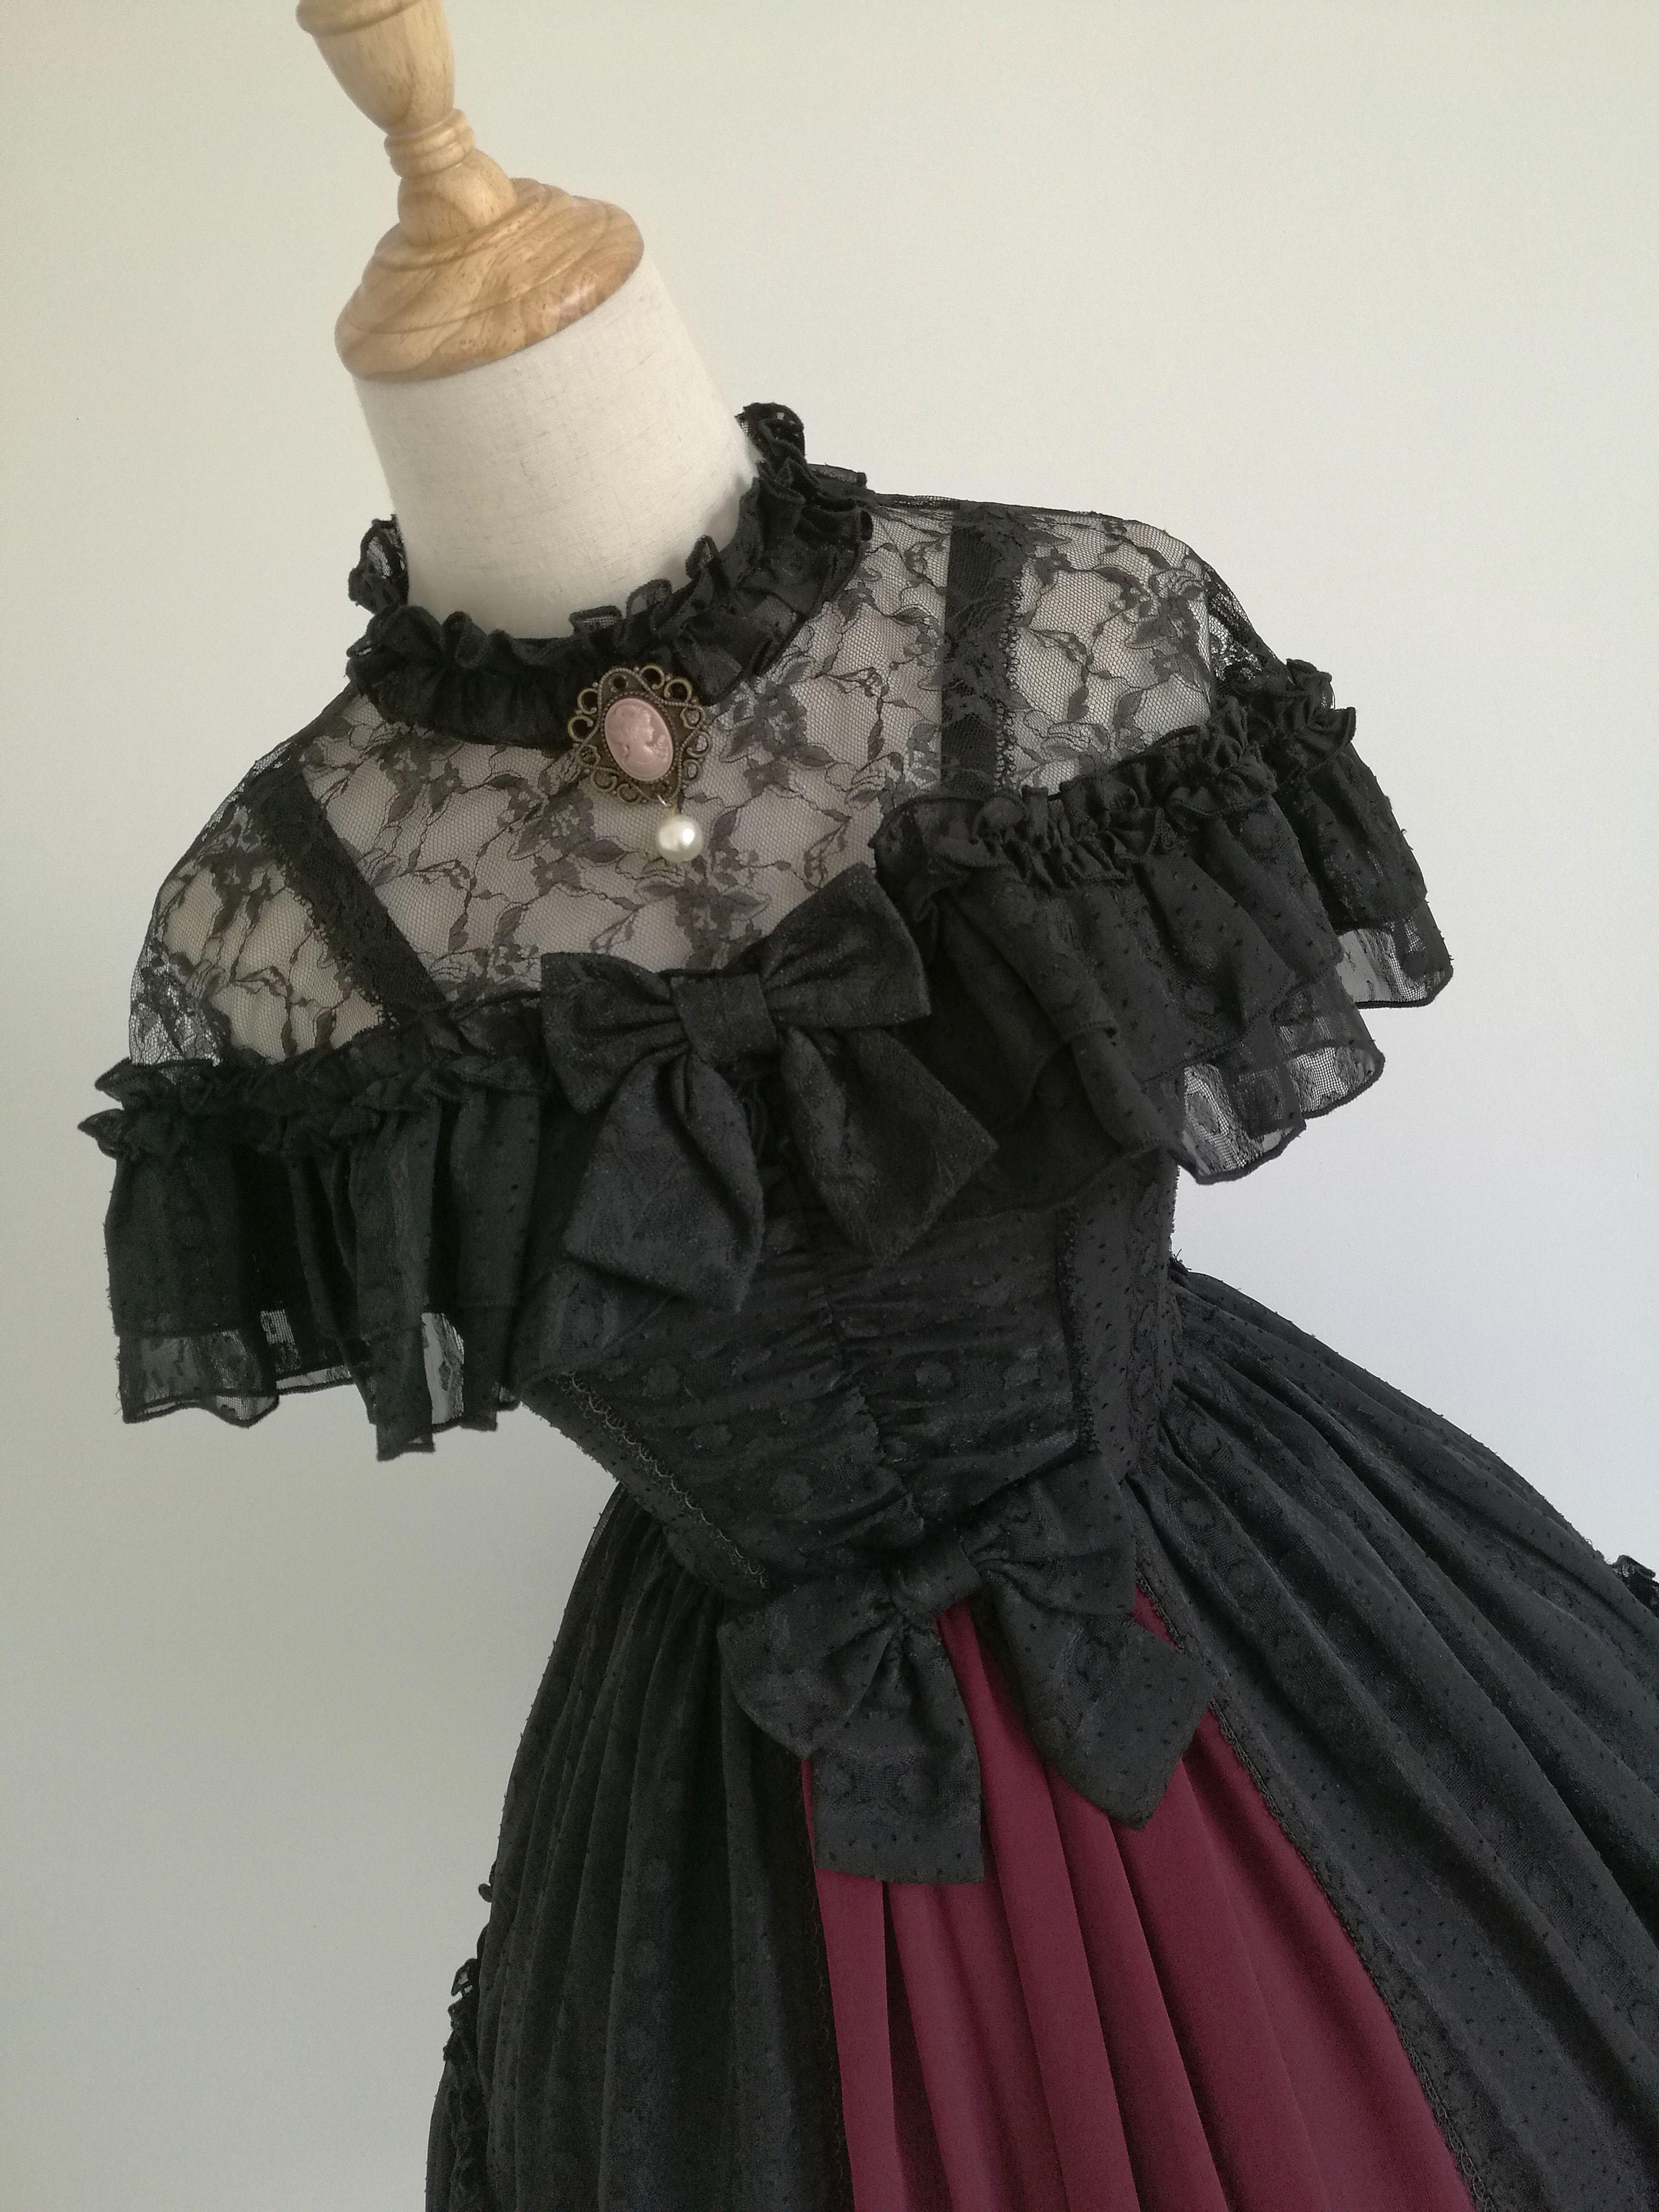 726ae9bff754 ◇蔷薇丛◇JSK定金页面-淘宝网全球站 | Girl clothing in 2019 | Gothic ...